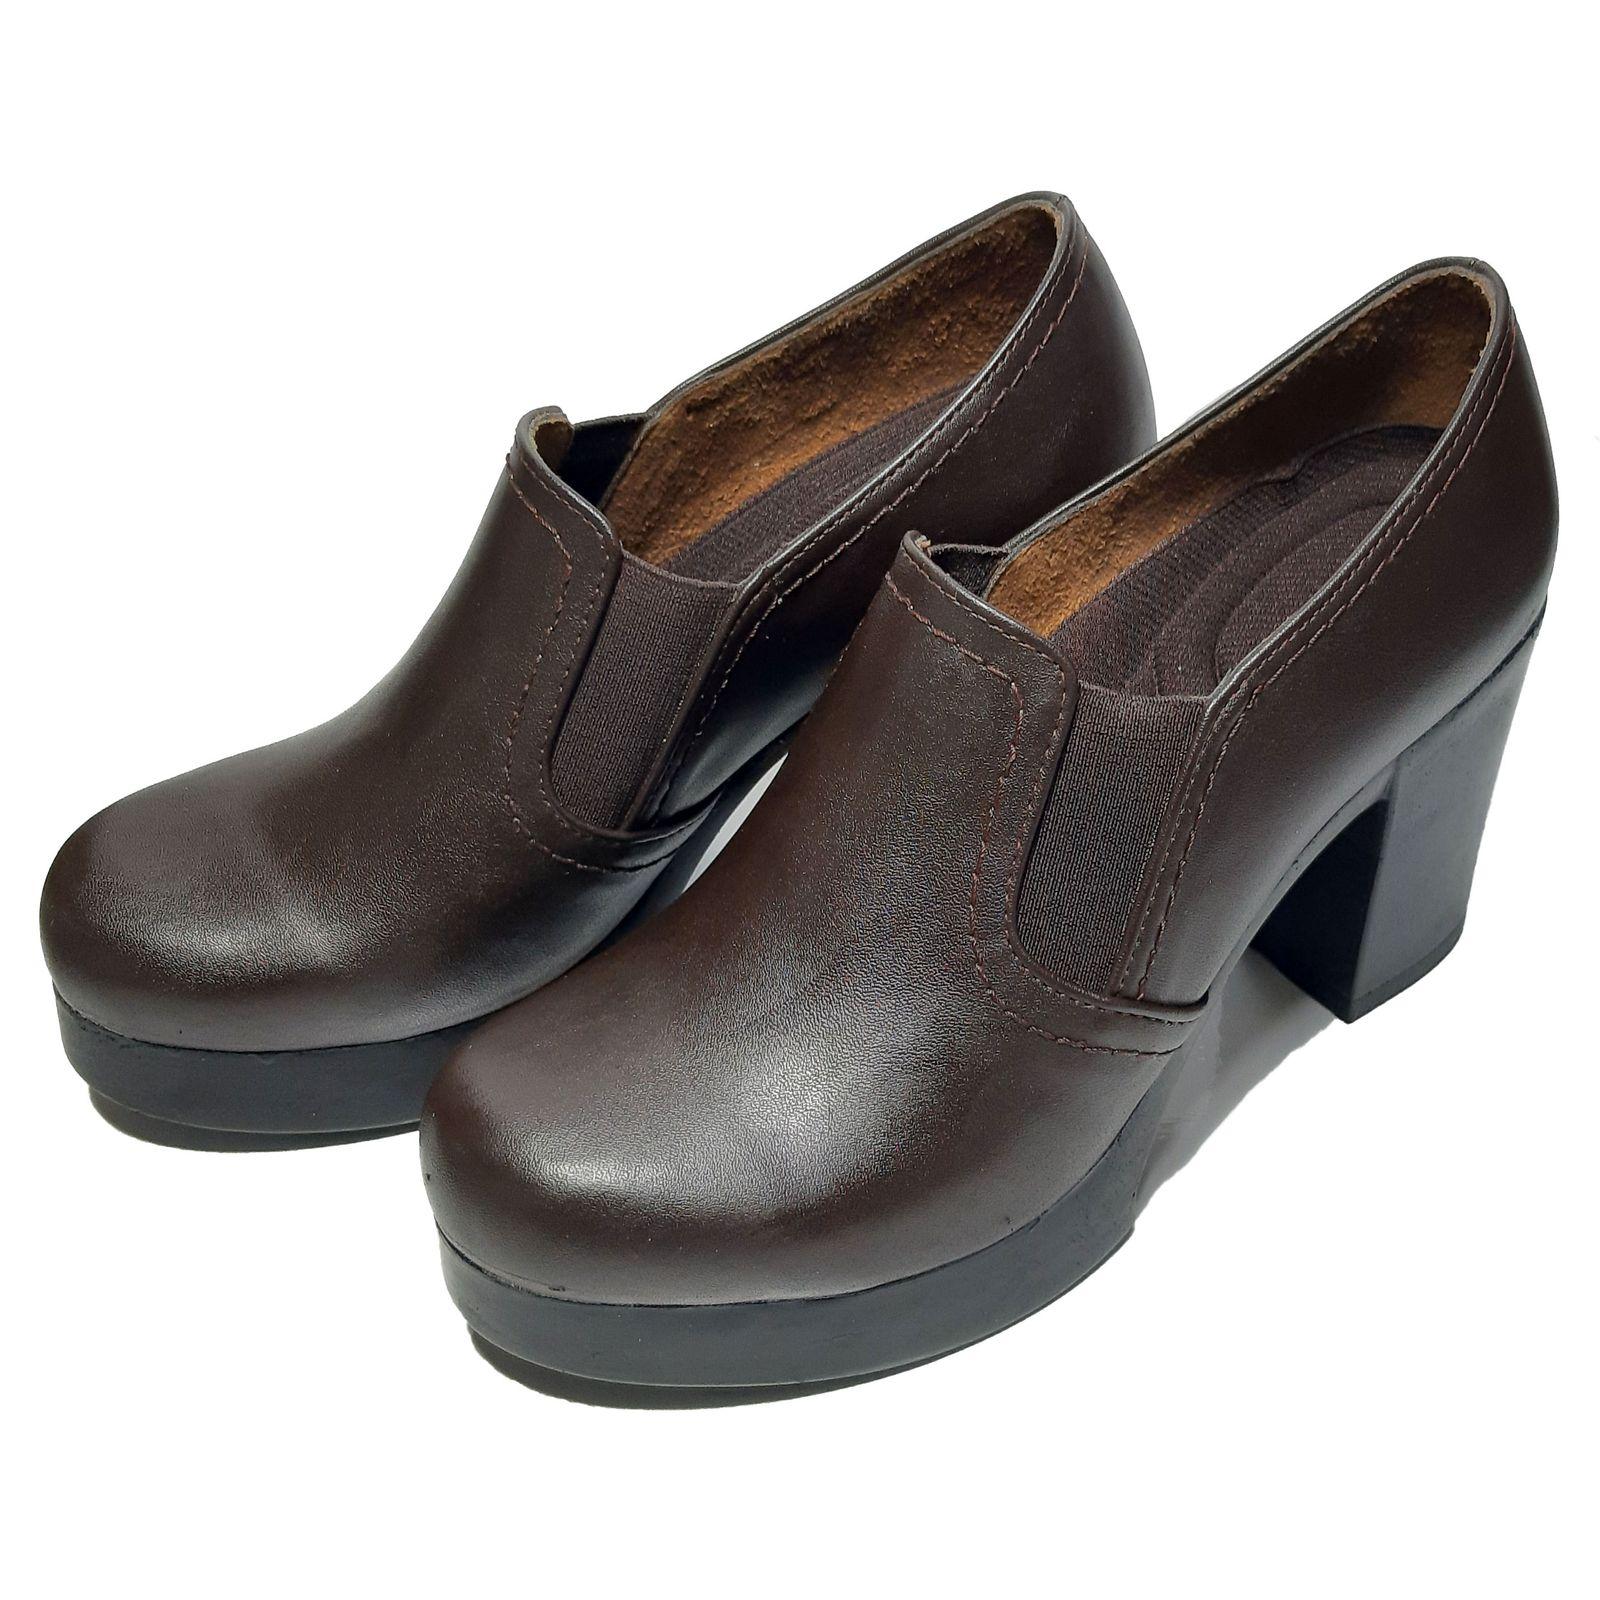 کفش زنانه مدل پرنس -  - 6